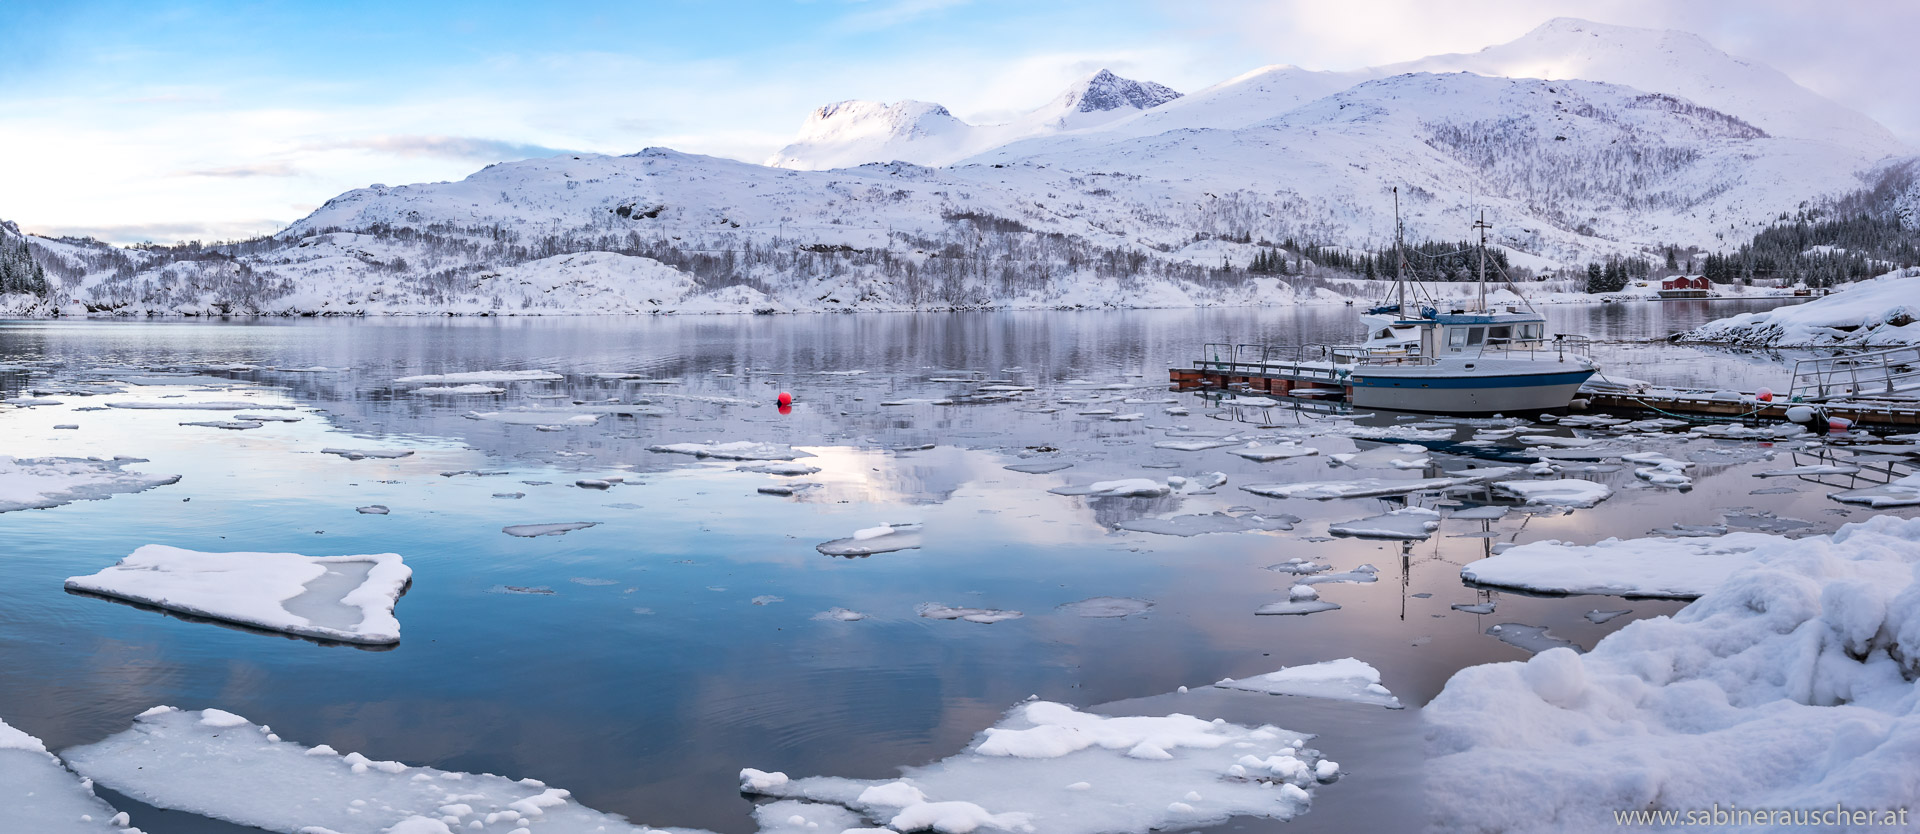 the Fjord of Sildpollnes | am Fjord von Sildpollnes